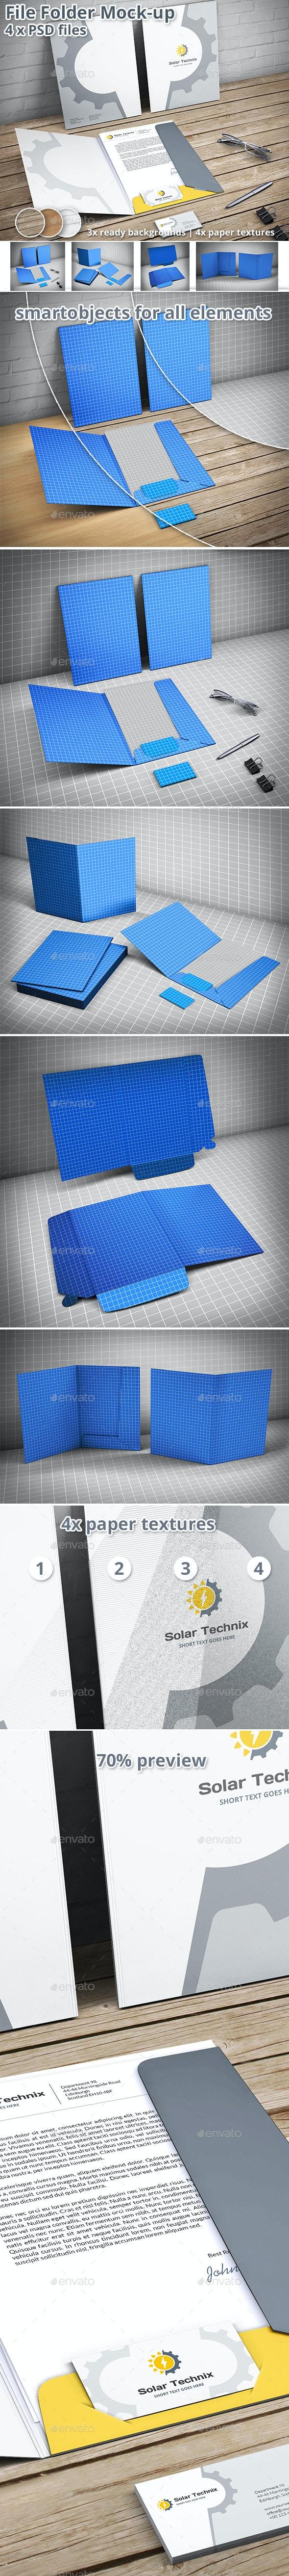 Document Folder Mockup - File Folder - Print Product Mock-Ups